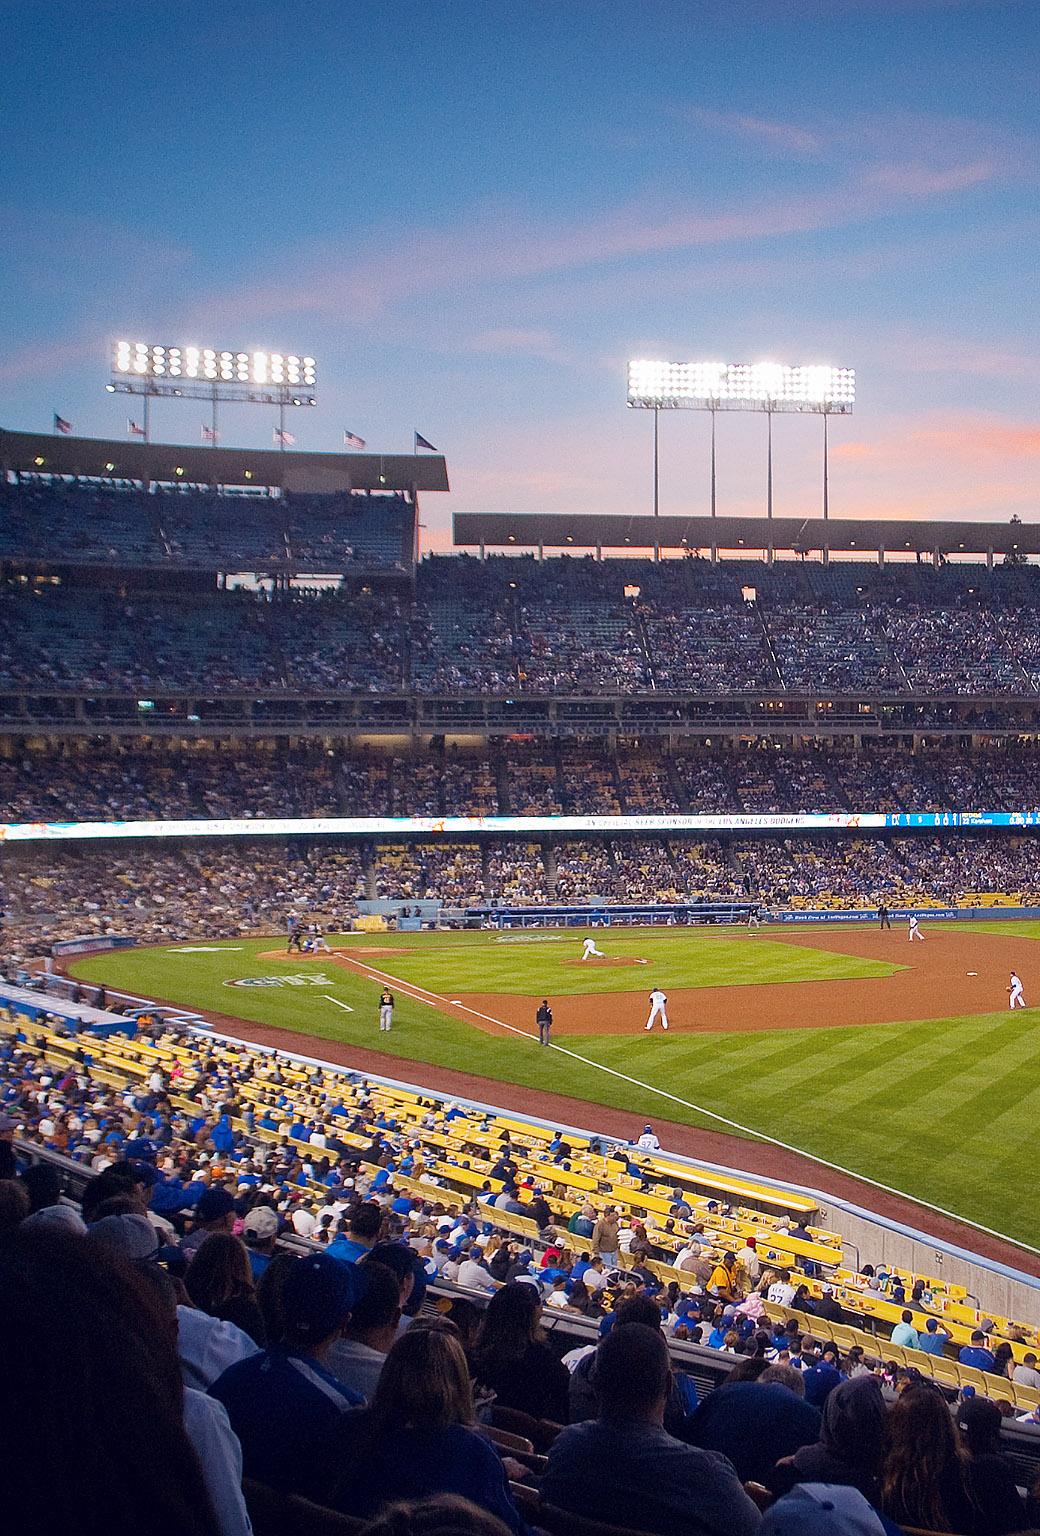 La Dodgers Iphone Wallpaper Wallpapers Of The Week Action Shots